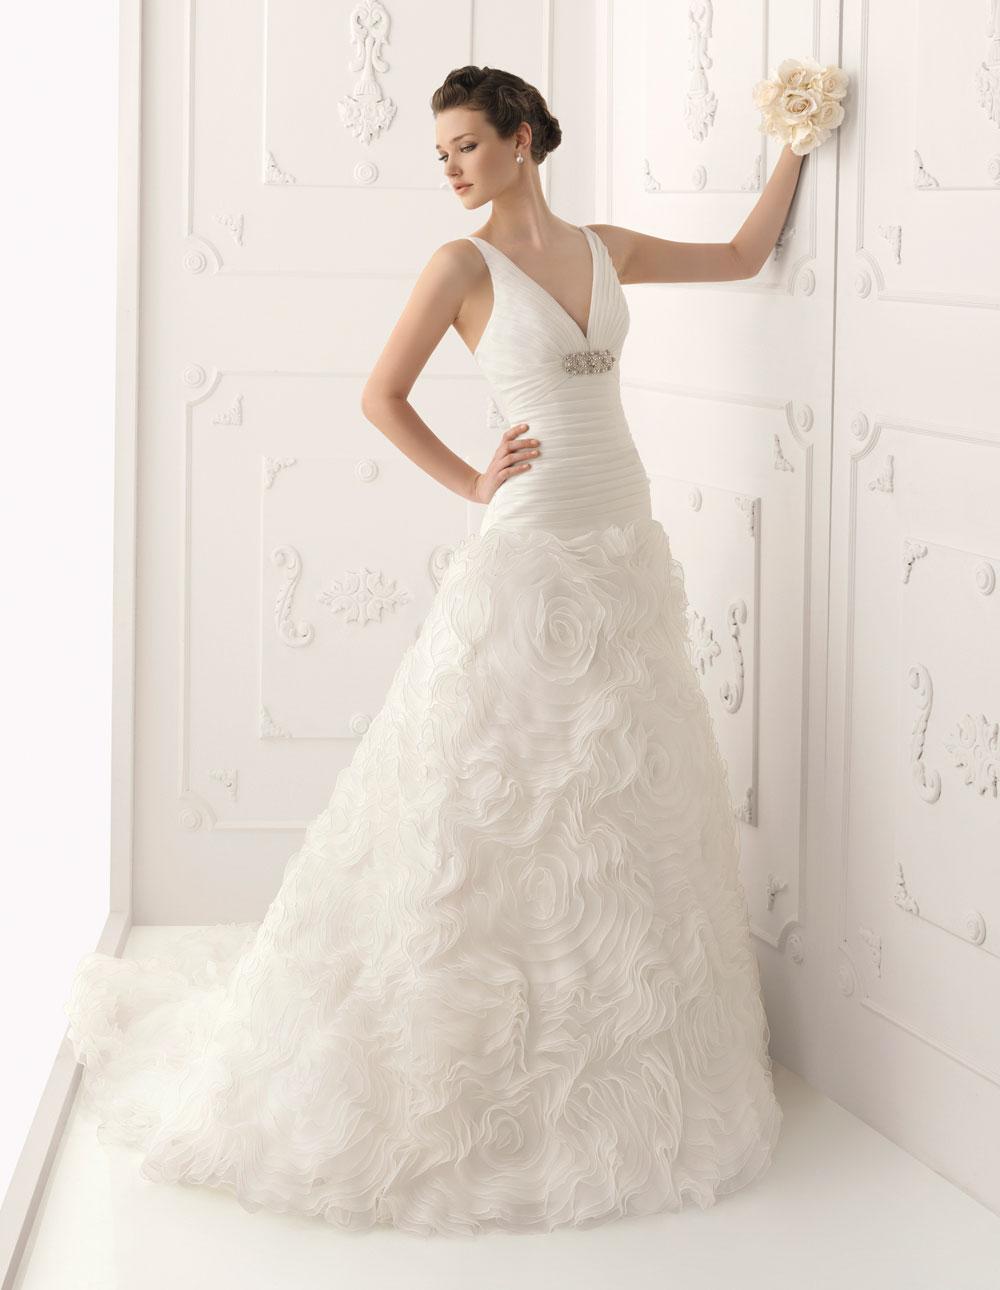 Iloilo wedding blog wedding gown inspiration alma novia for Alma novia wedding dress